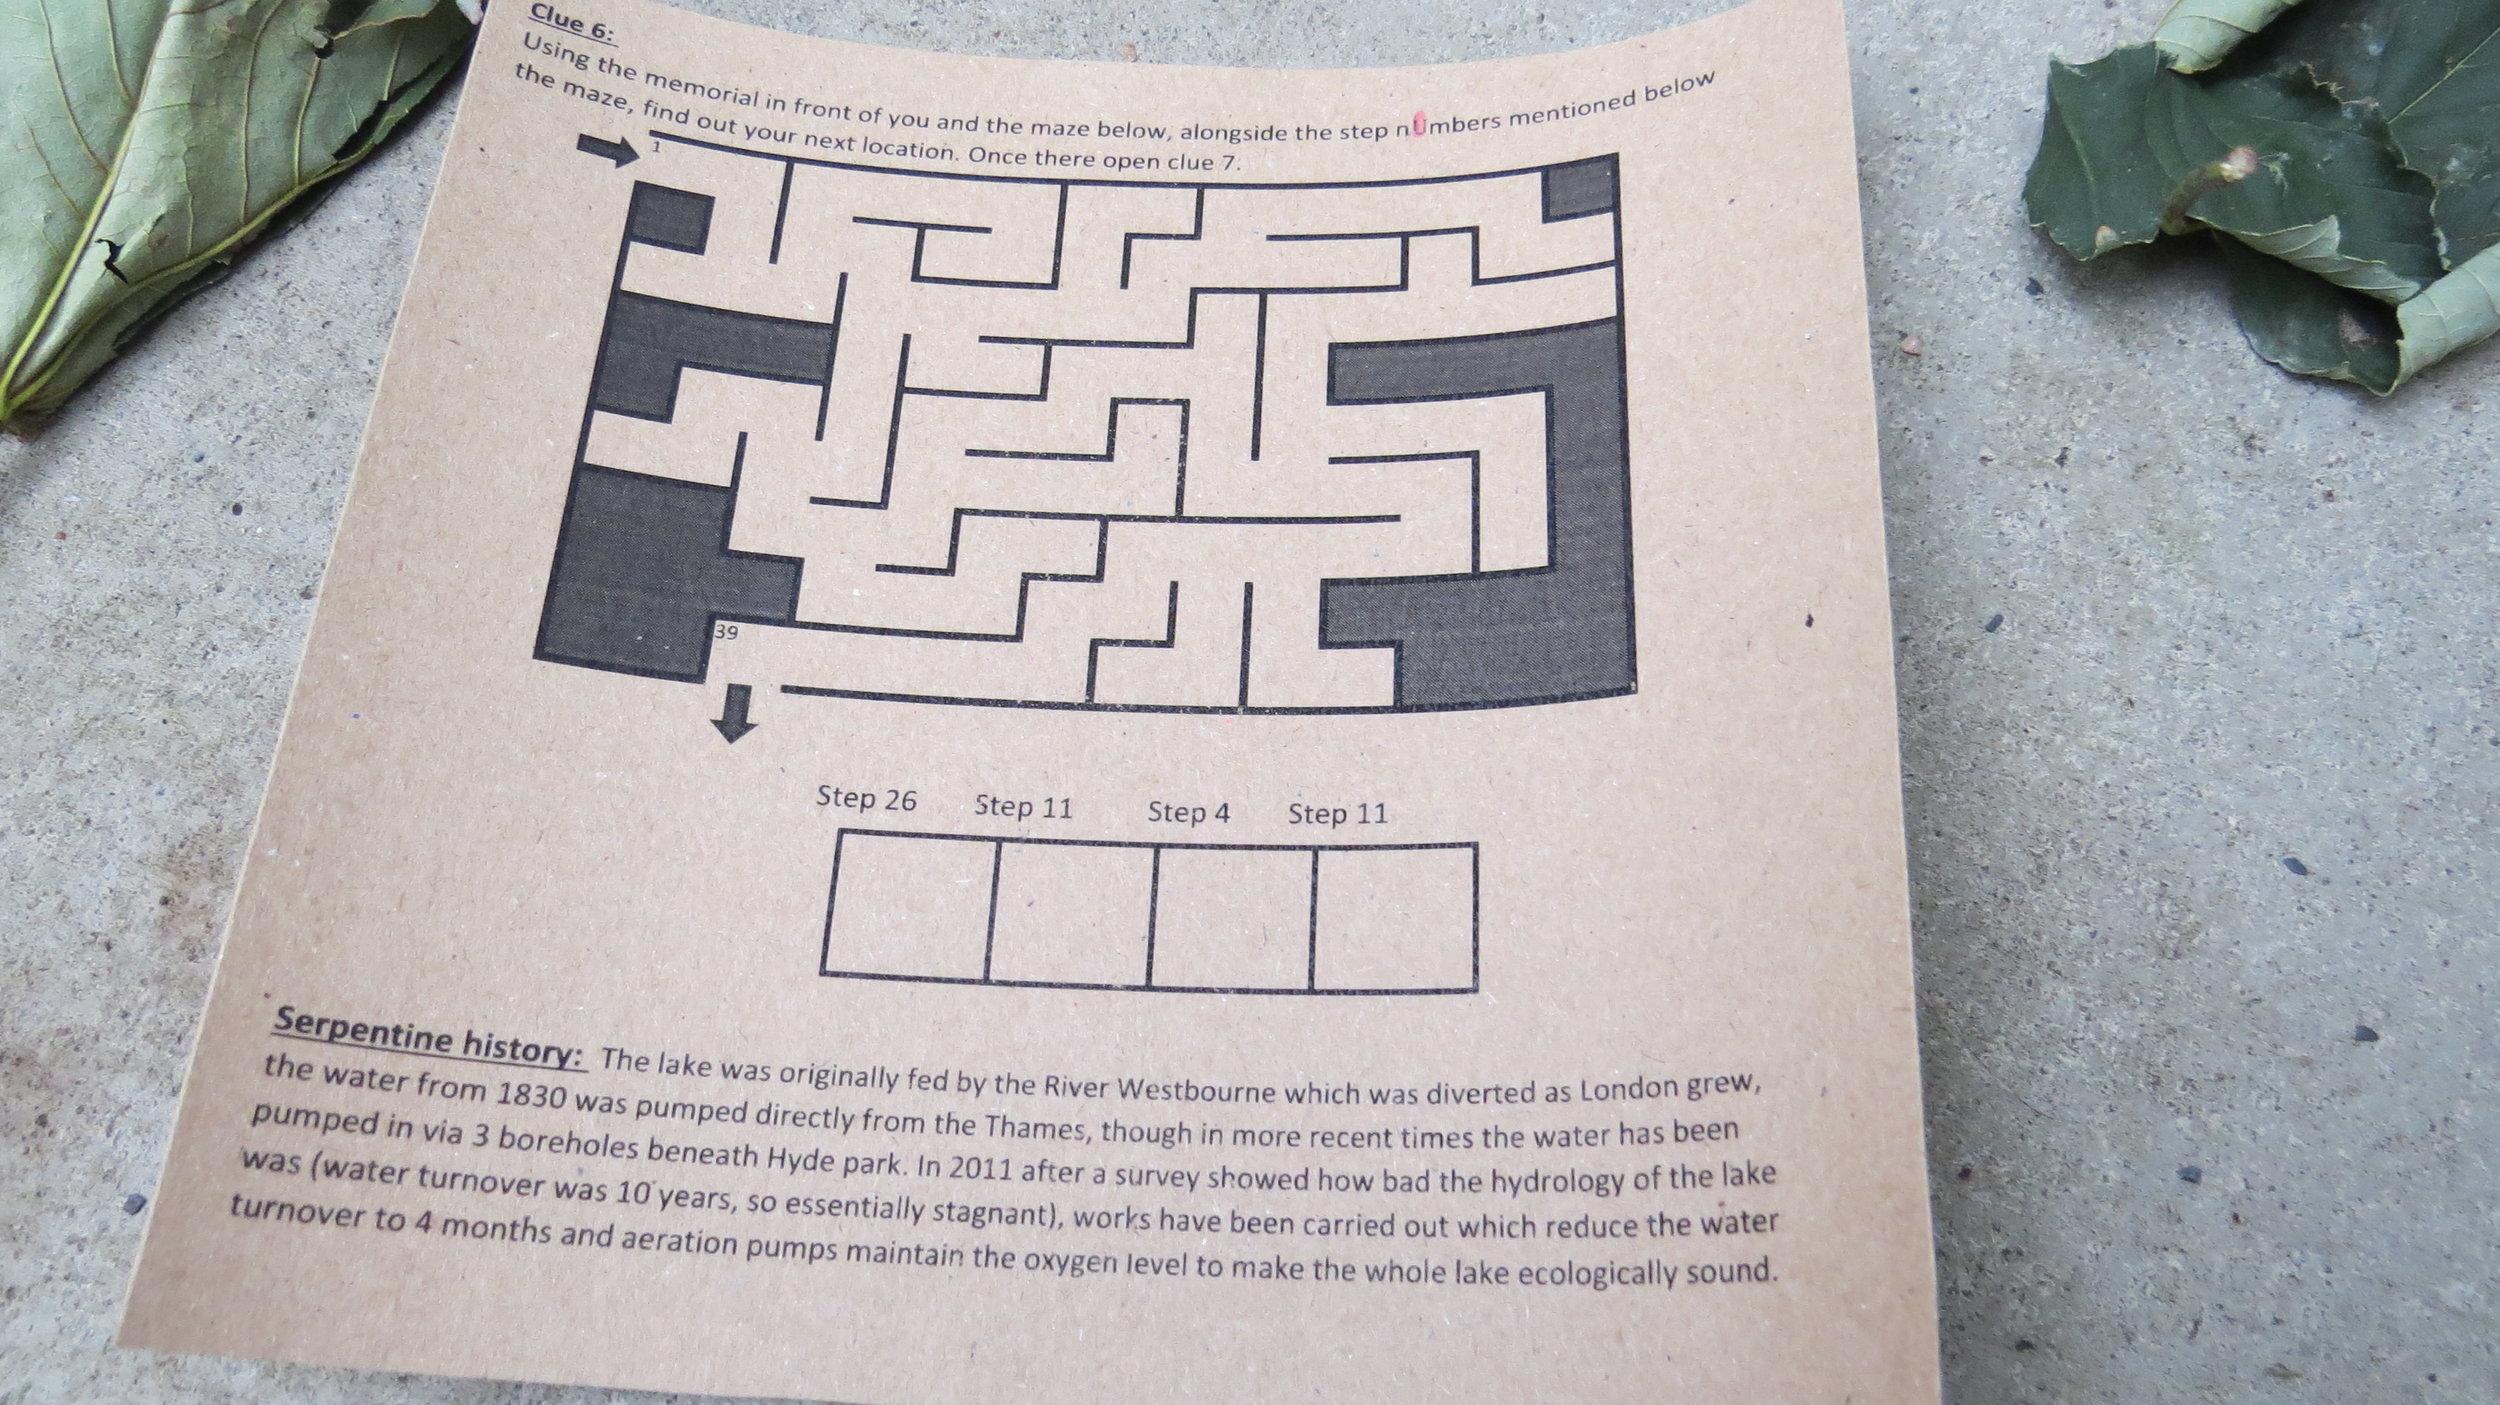 Clue 6